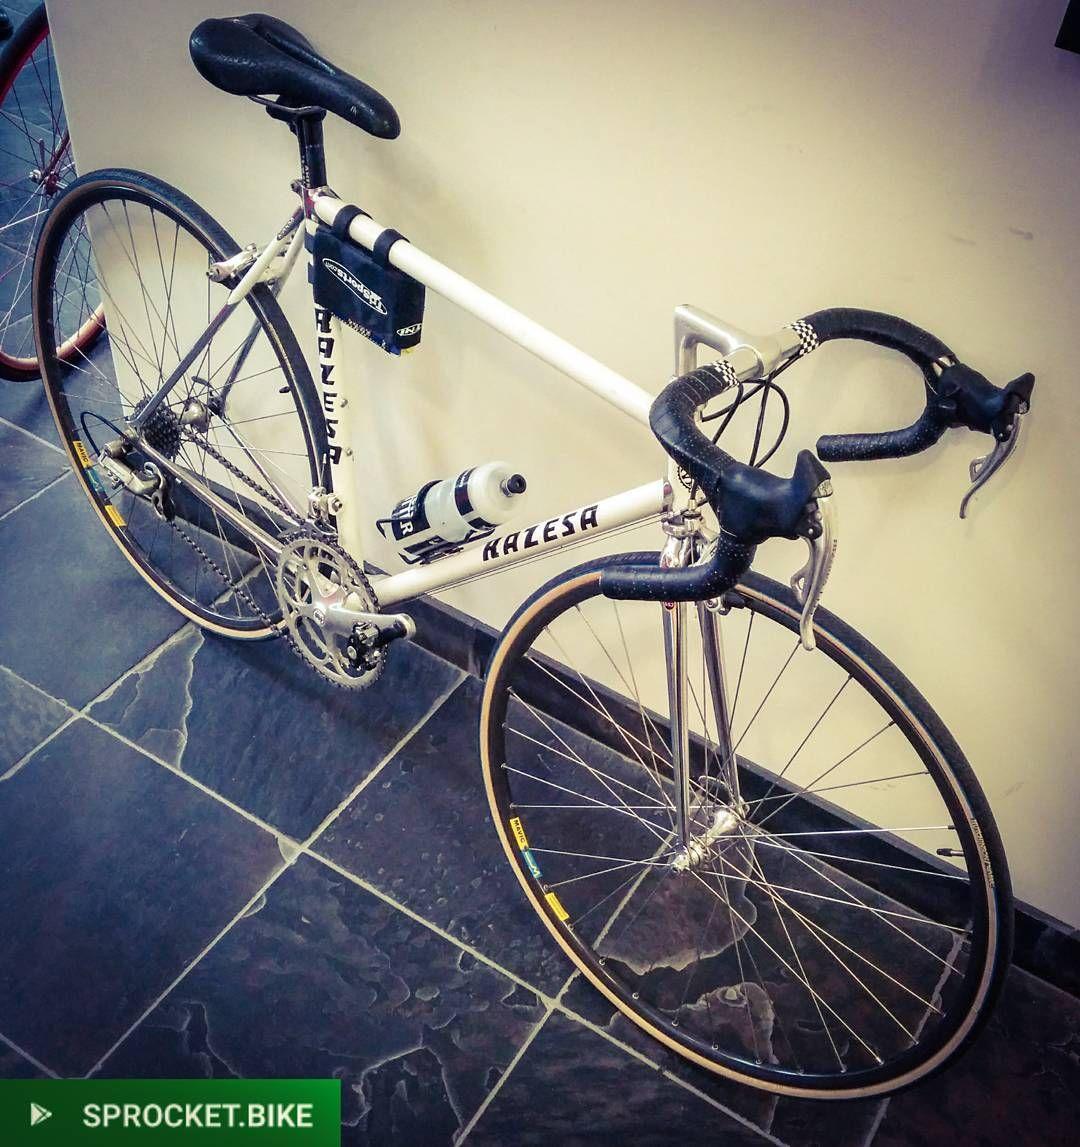 1991 Razesa Spanish road racing bicycle  The company used to